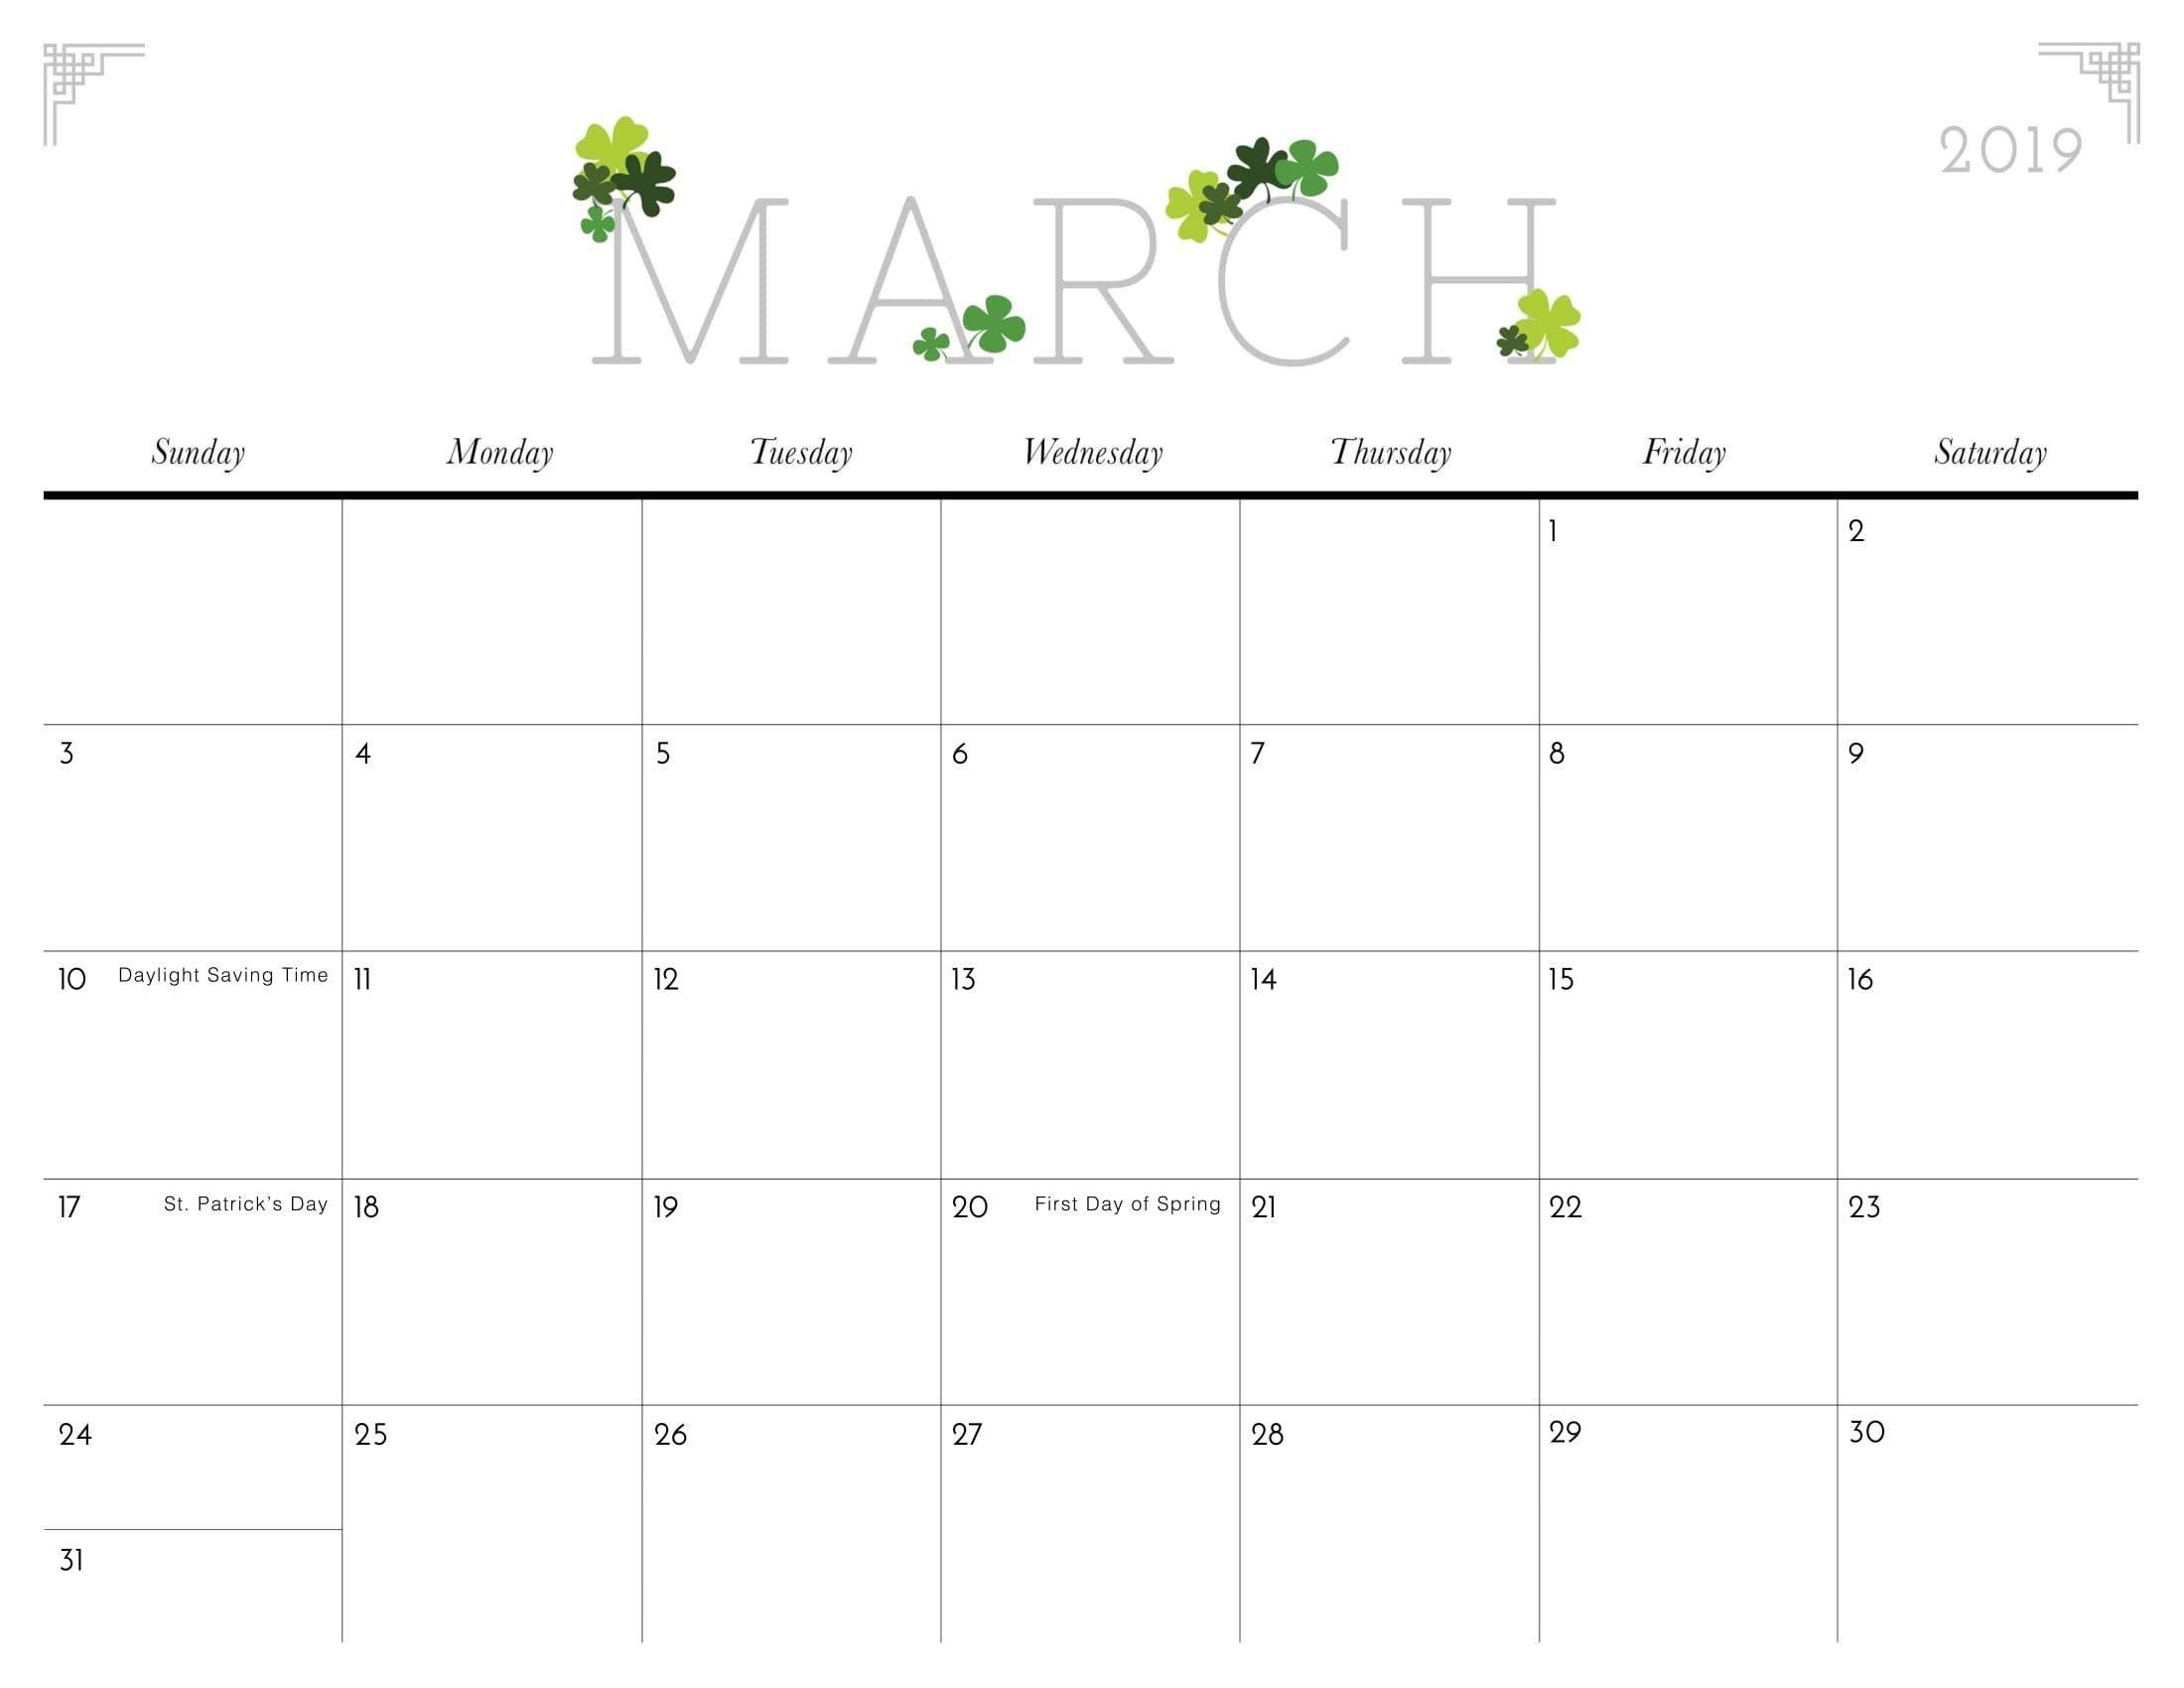 March Calendar 2018 Actual Cute March 2019 Calendar Template Of March Calendar 2018 Más Recientes Calendar Template to Print Luxury Chore Chart Unique Chore Calendar